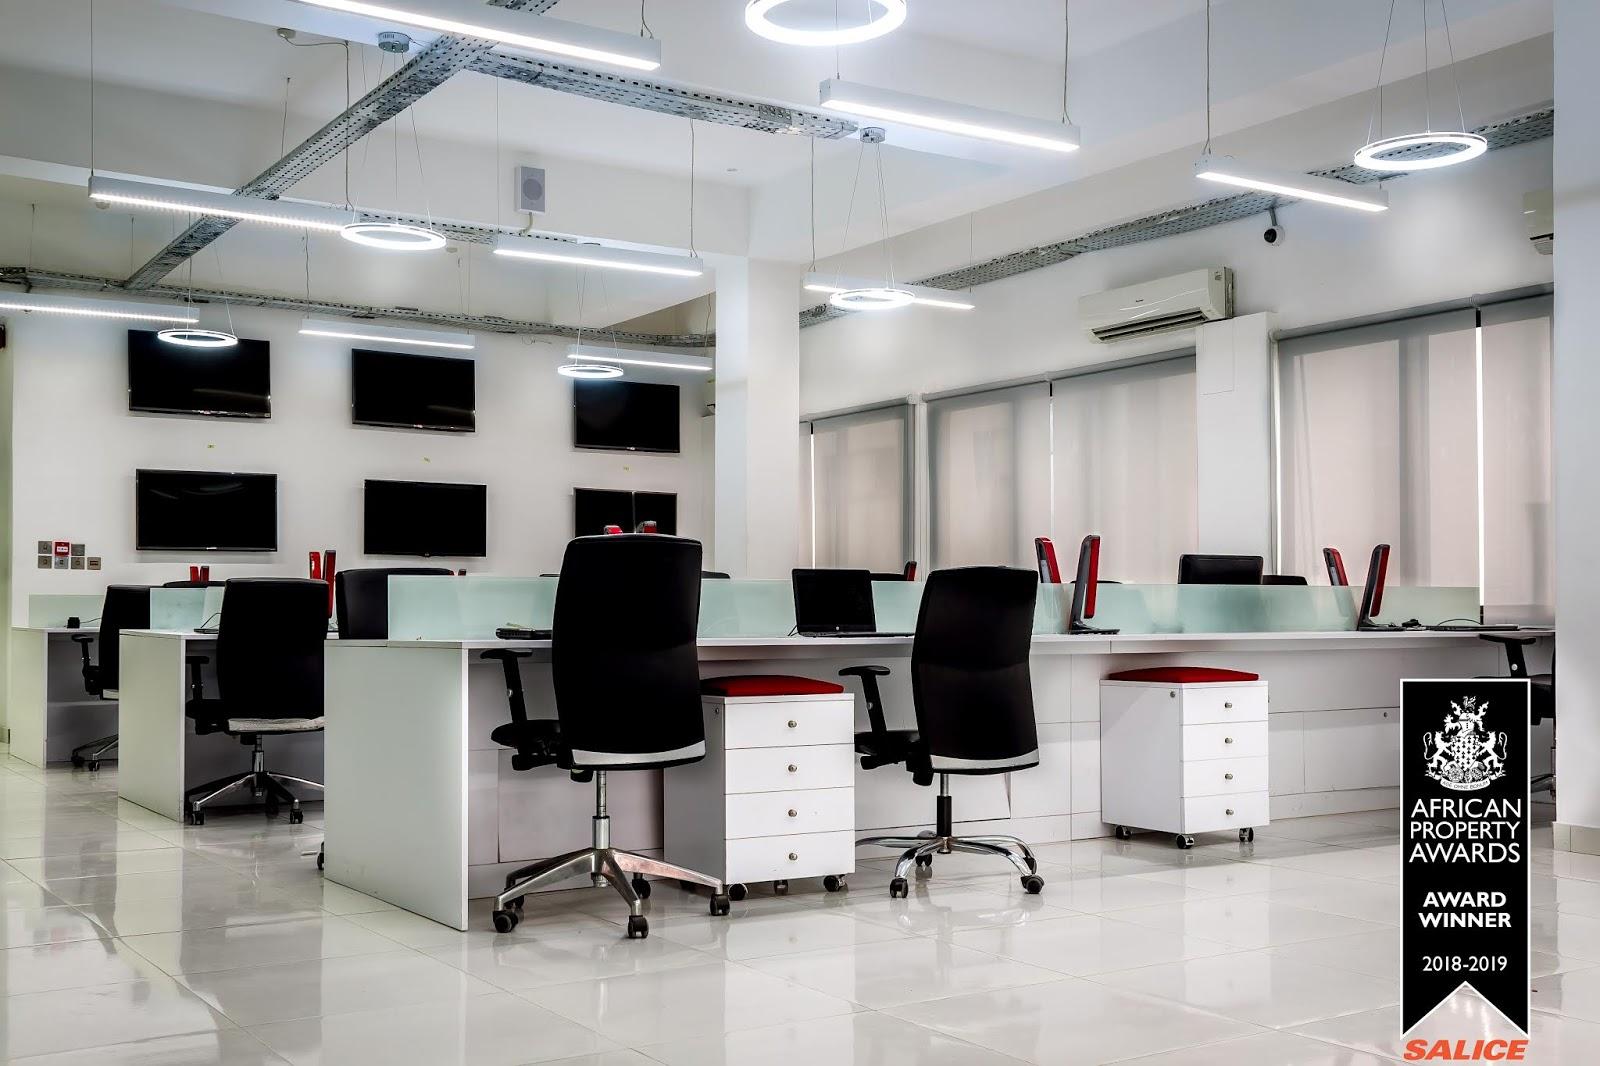 award winning office interiors large office gemona west interior designs win prestigious international property award for office category